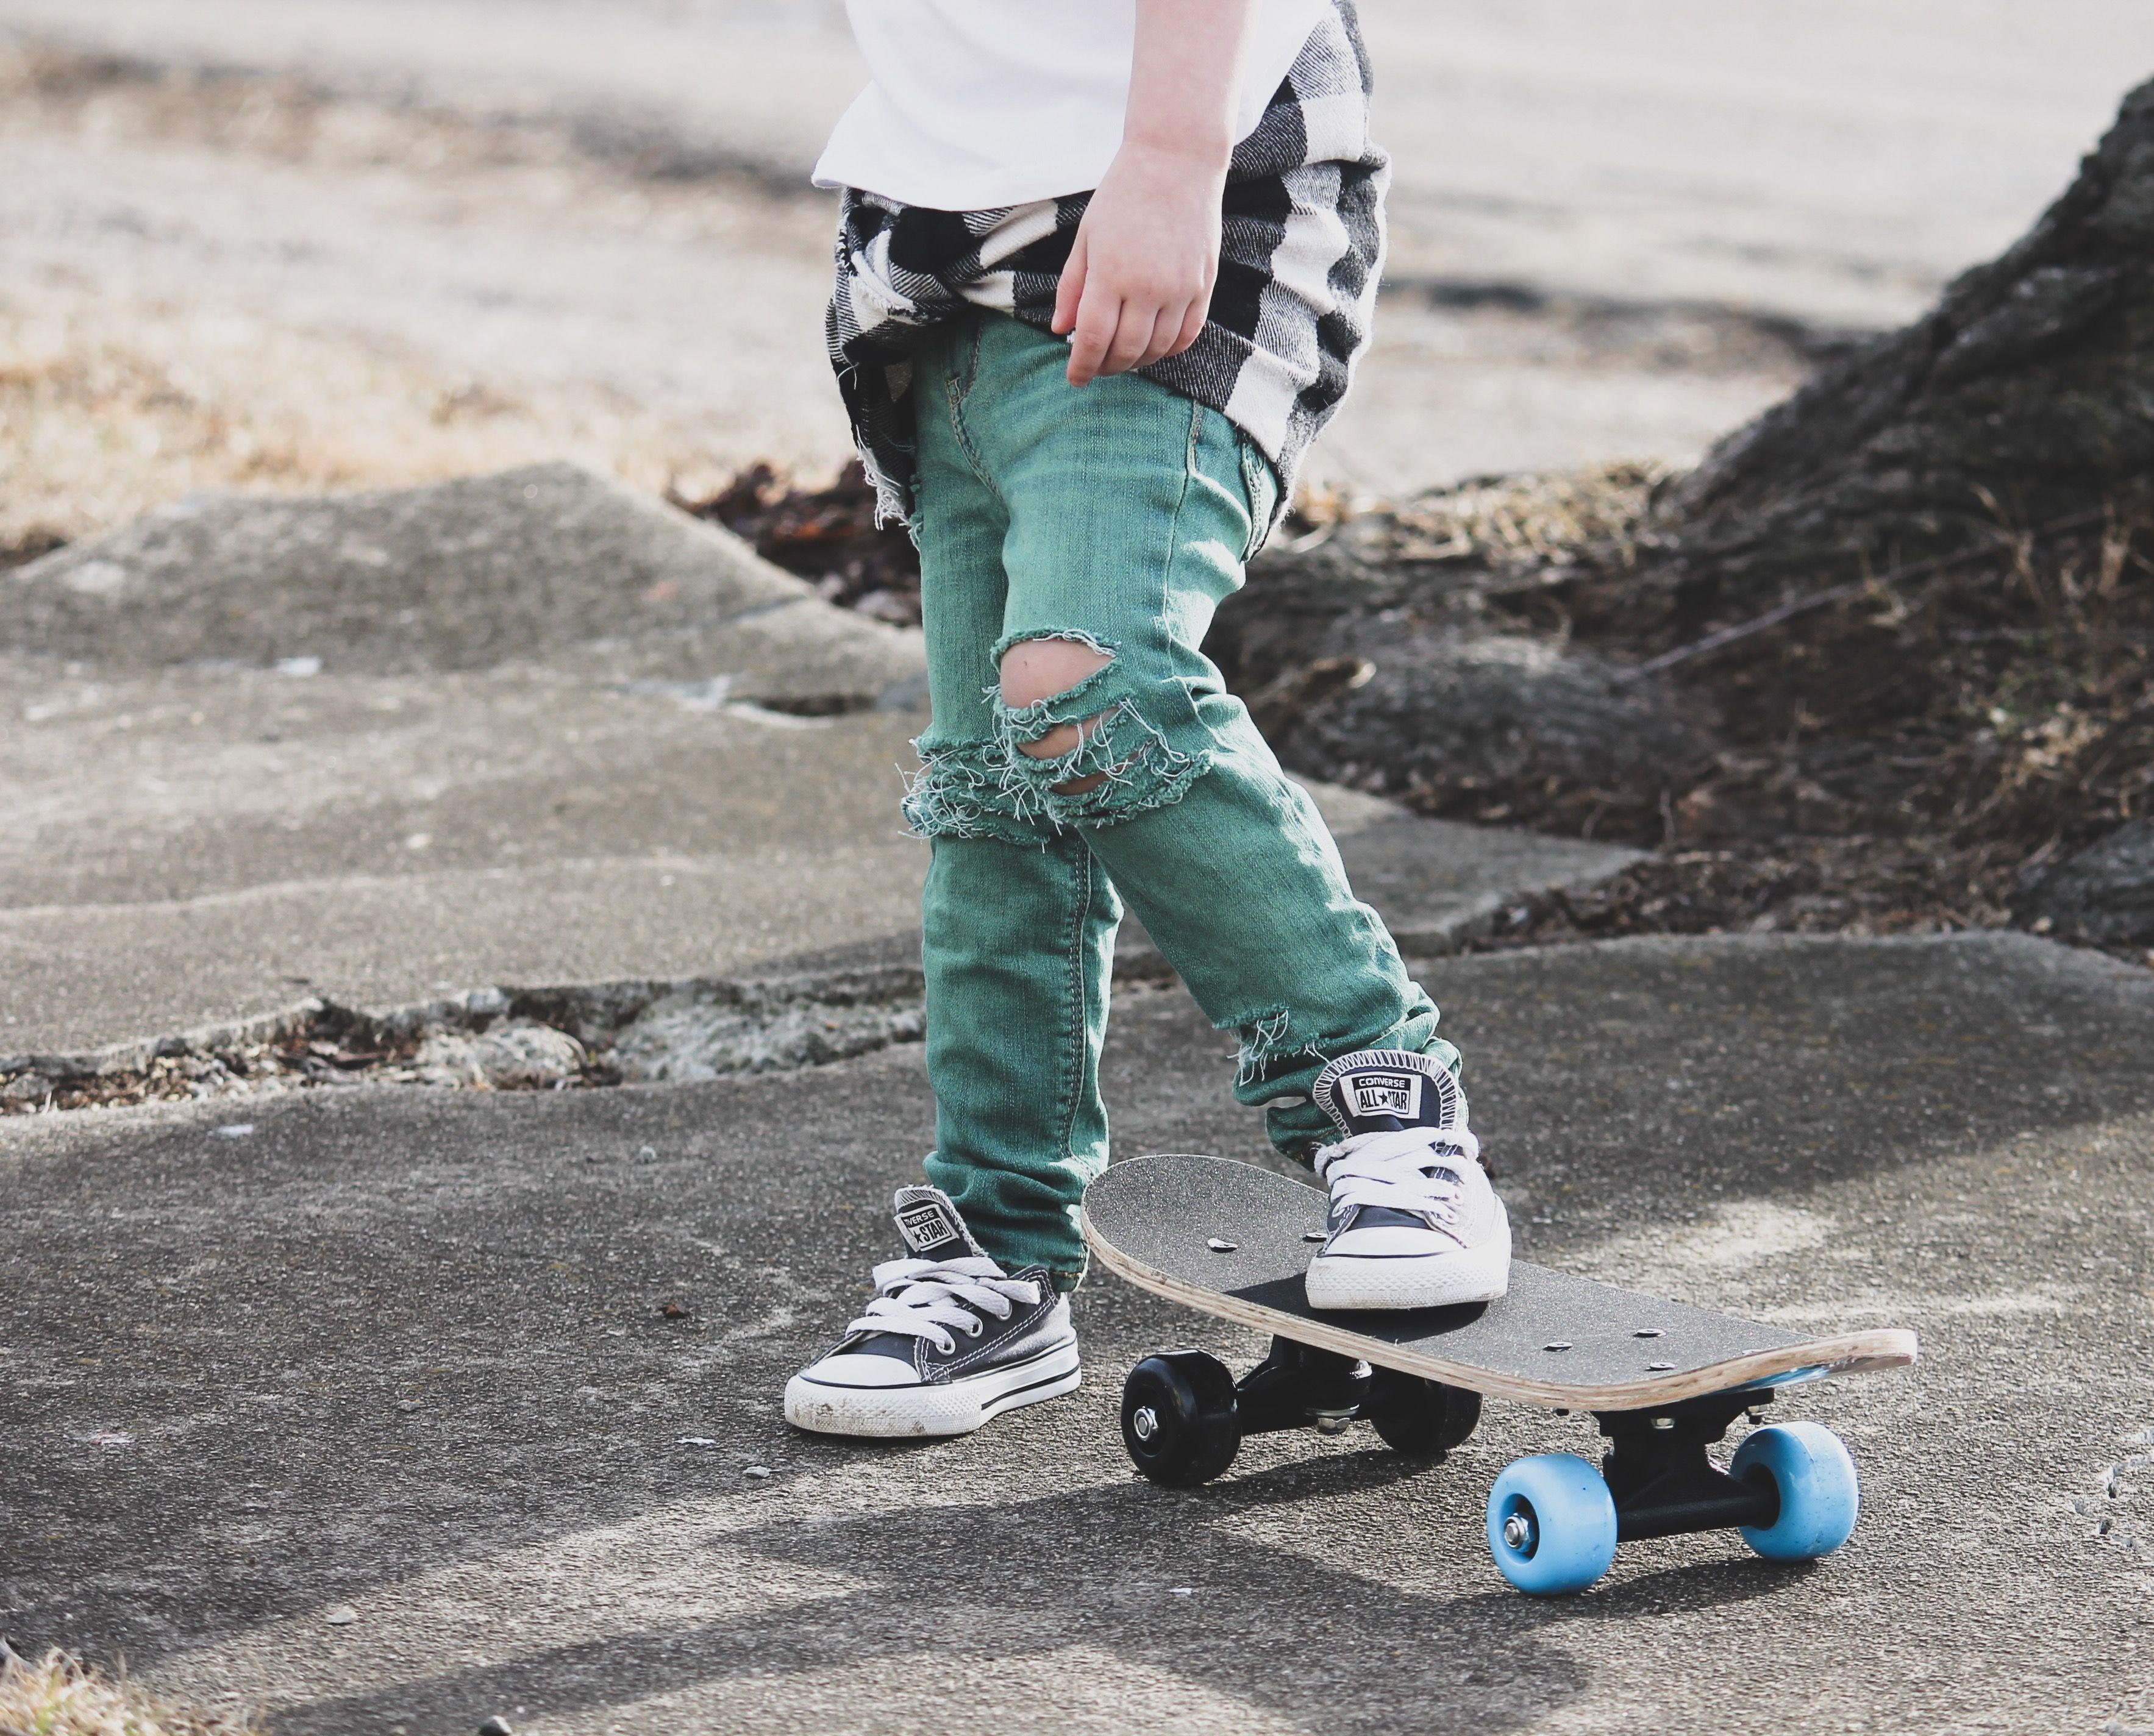 Green Jeans Distressed Denim Skinny Jeans Toddler Style Skater Outfits Skater Outfits Toddler Fashion Green Jeans